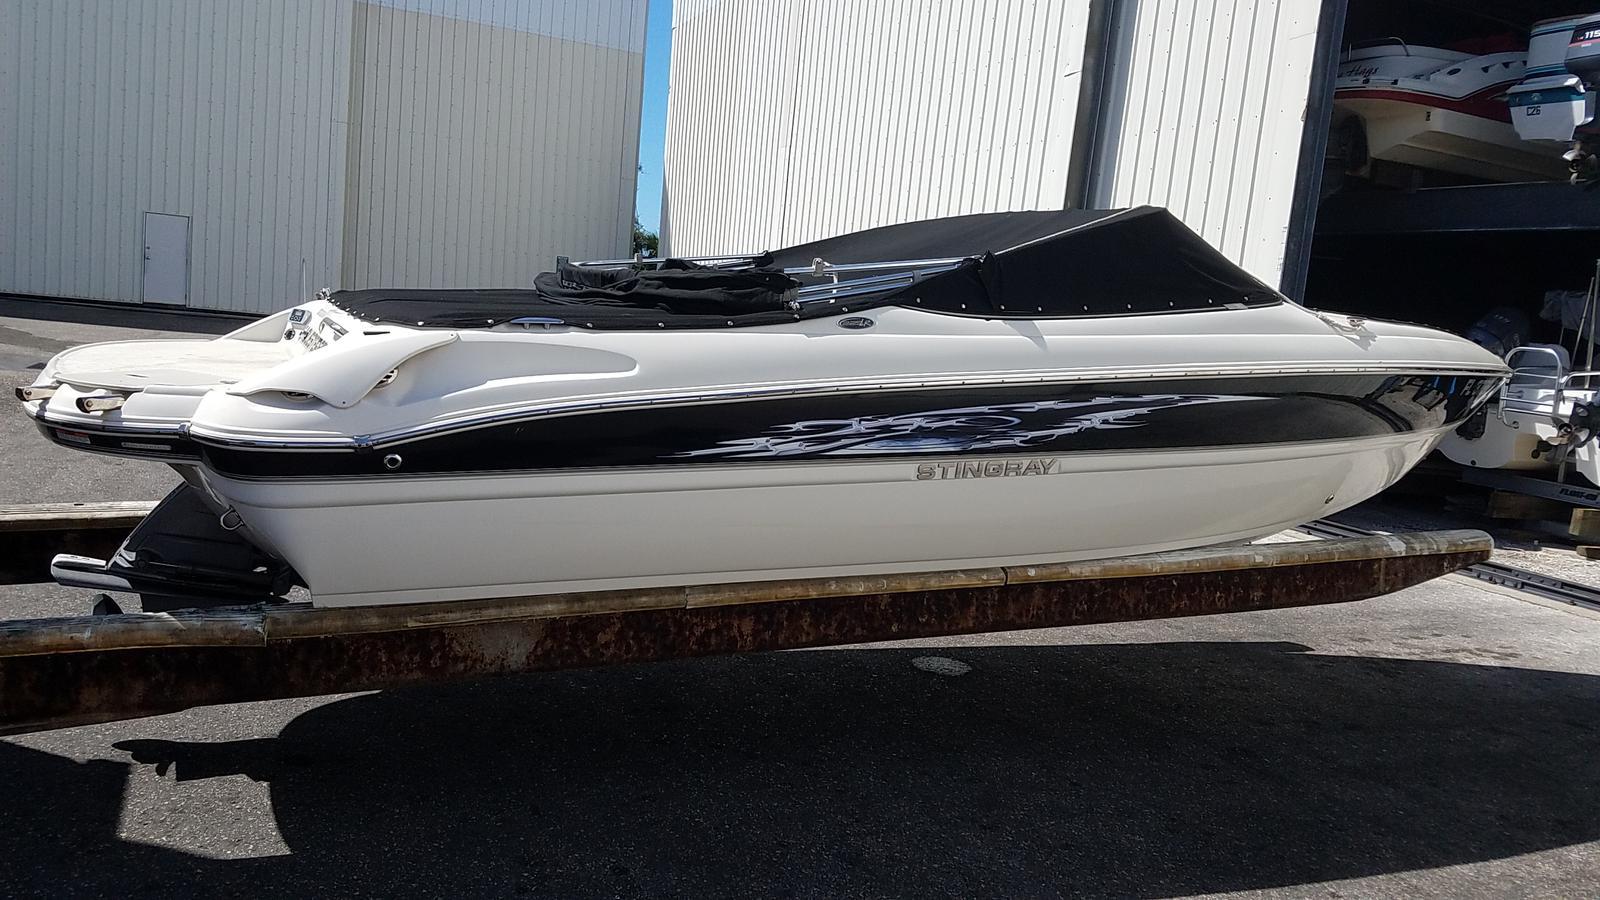 USED 2013 Stingray Boats 225LR | Sarasota, FL